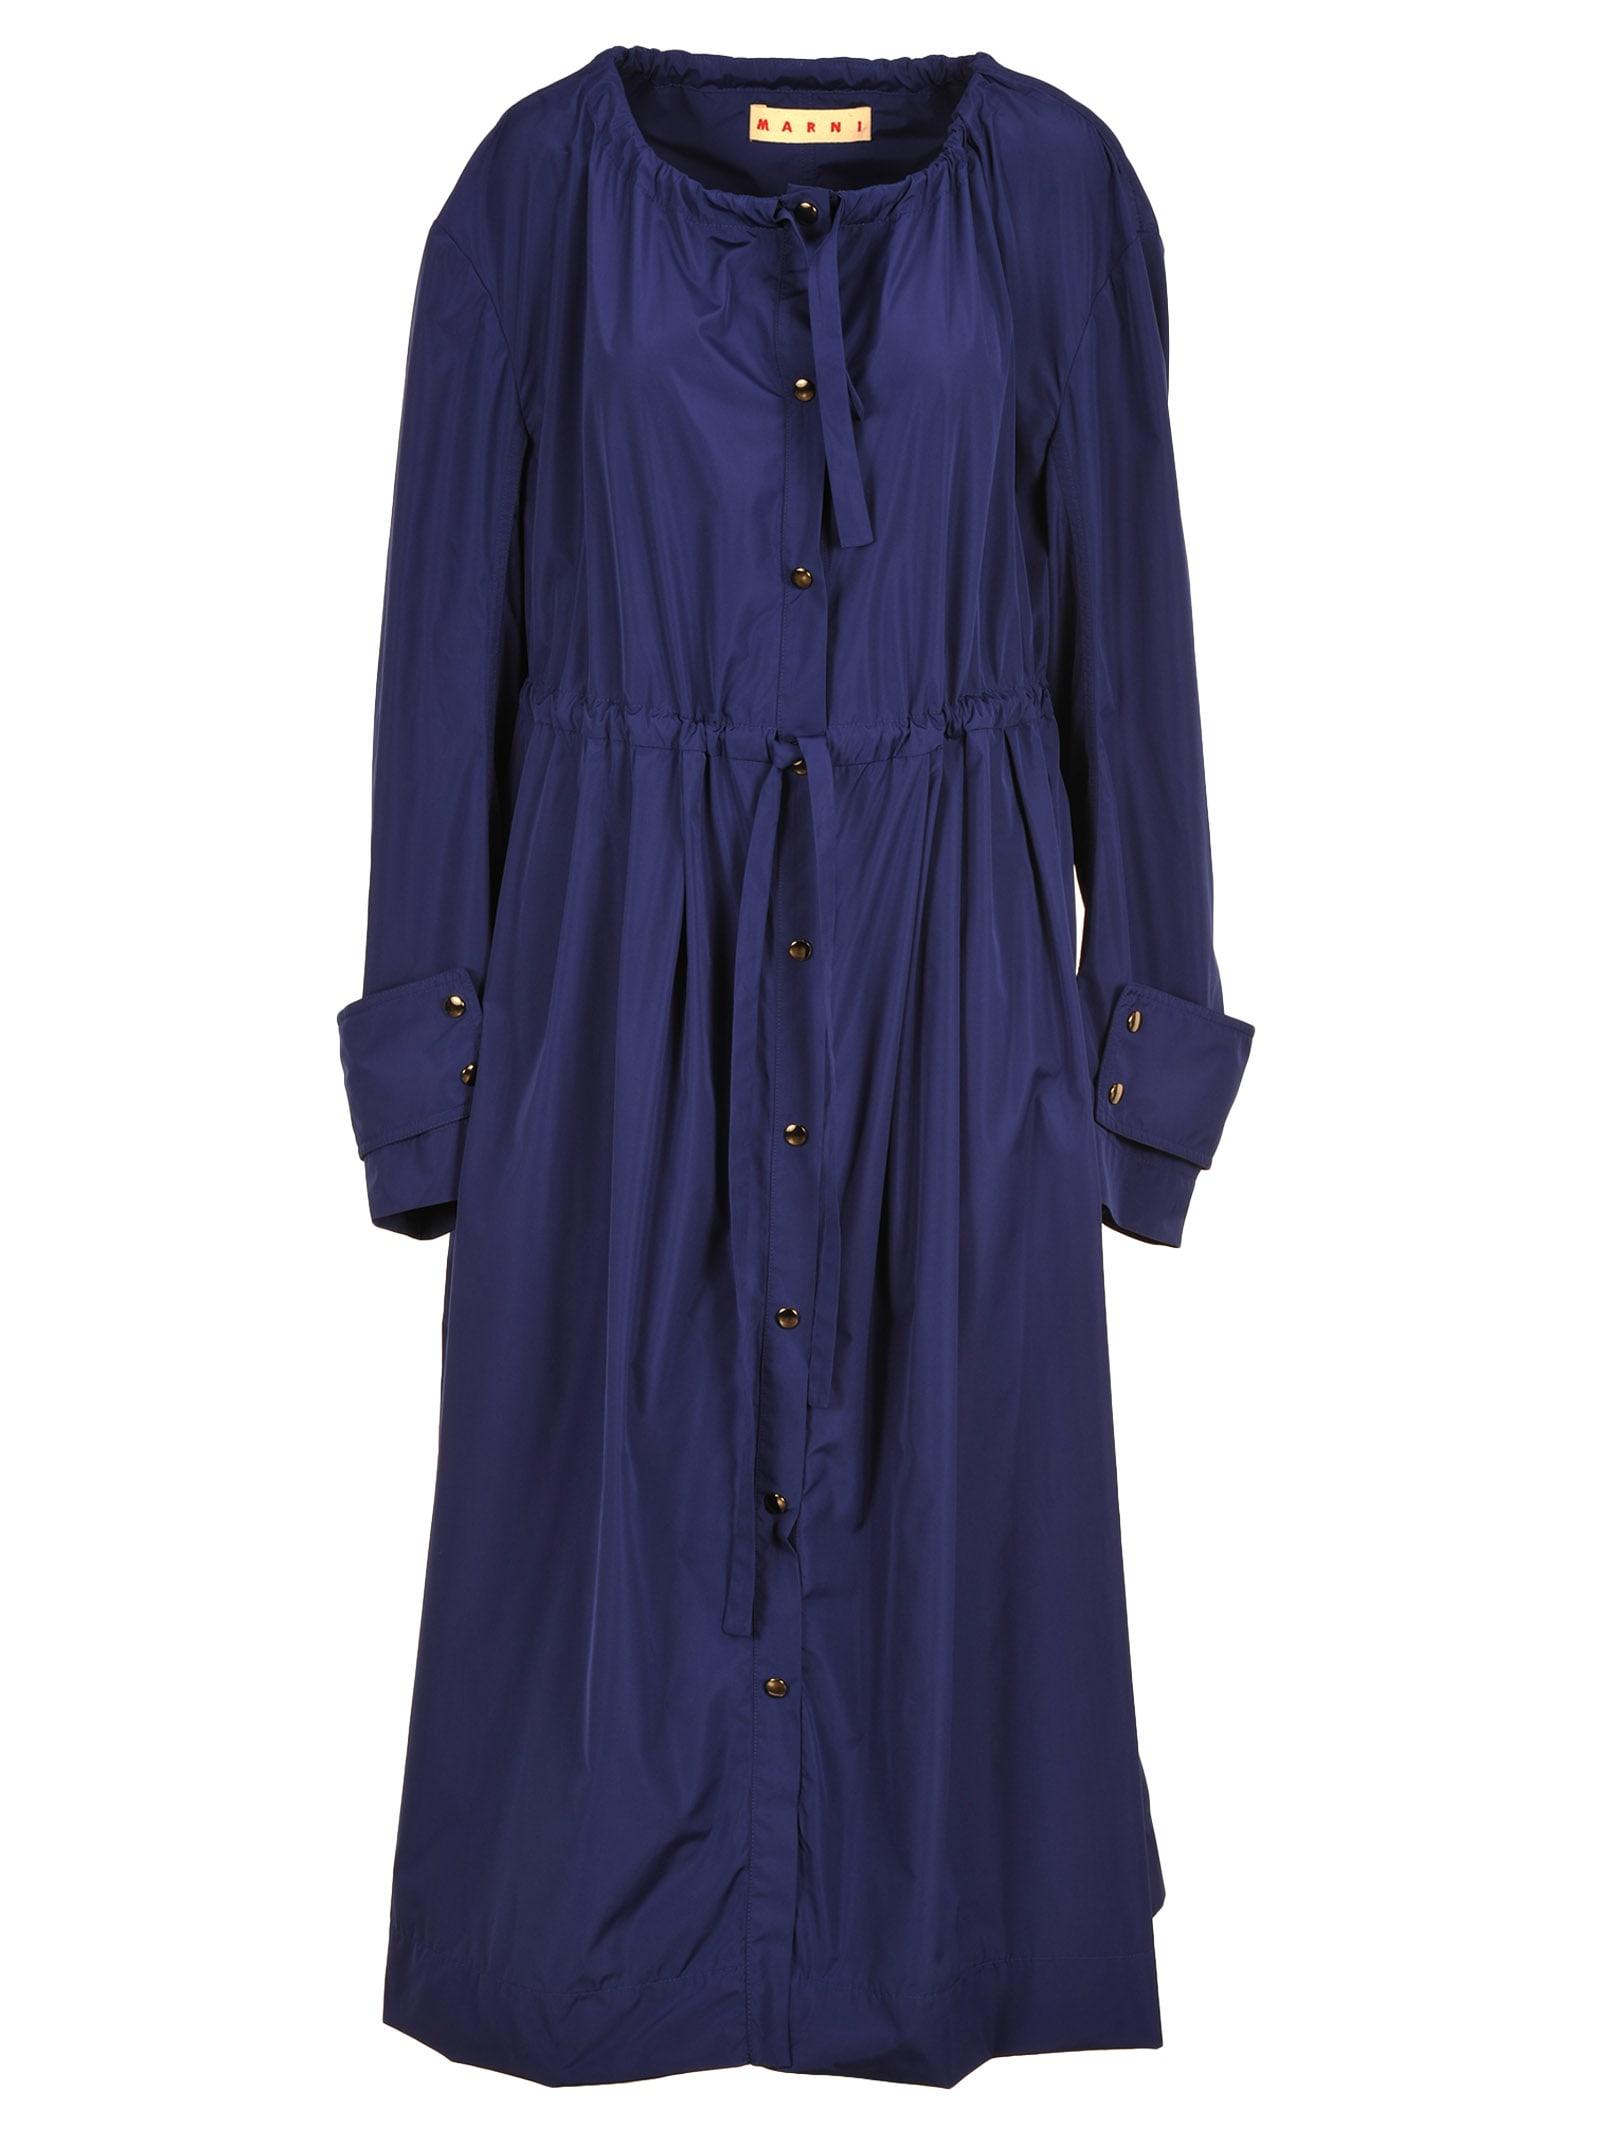 Marni Marni Drawstring Parka Coat